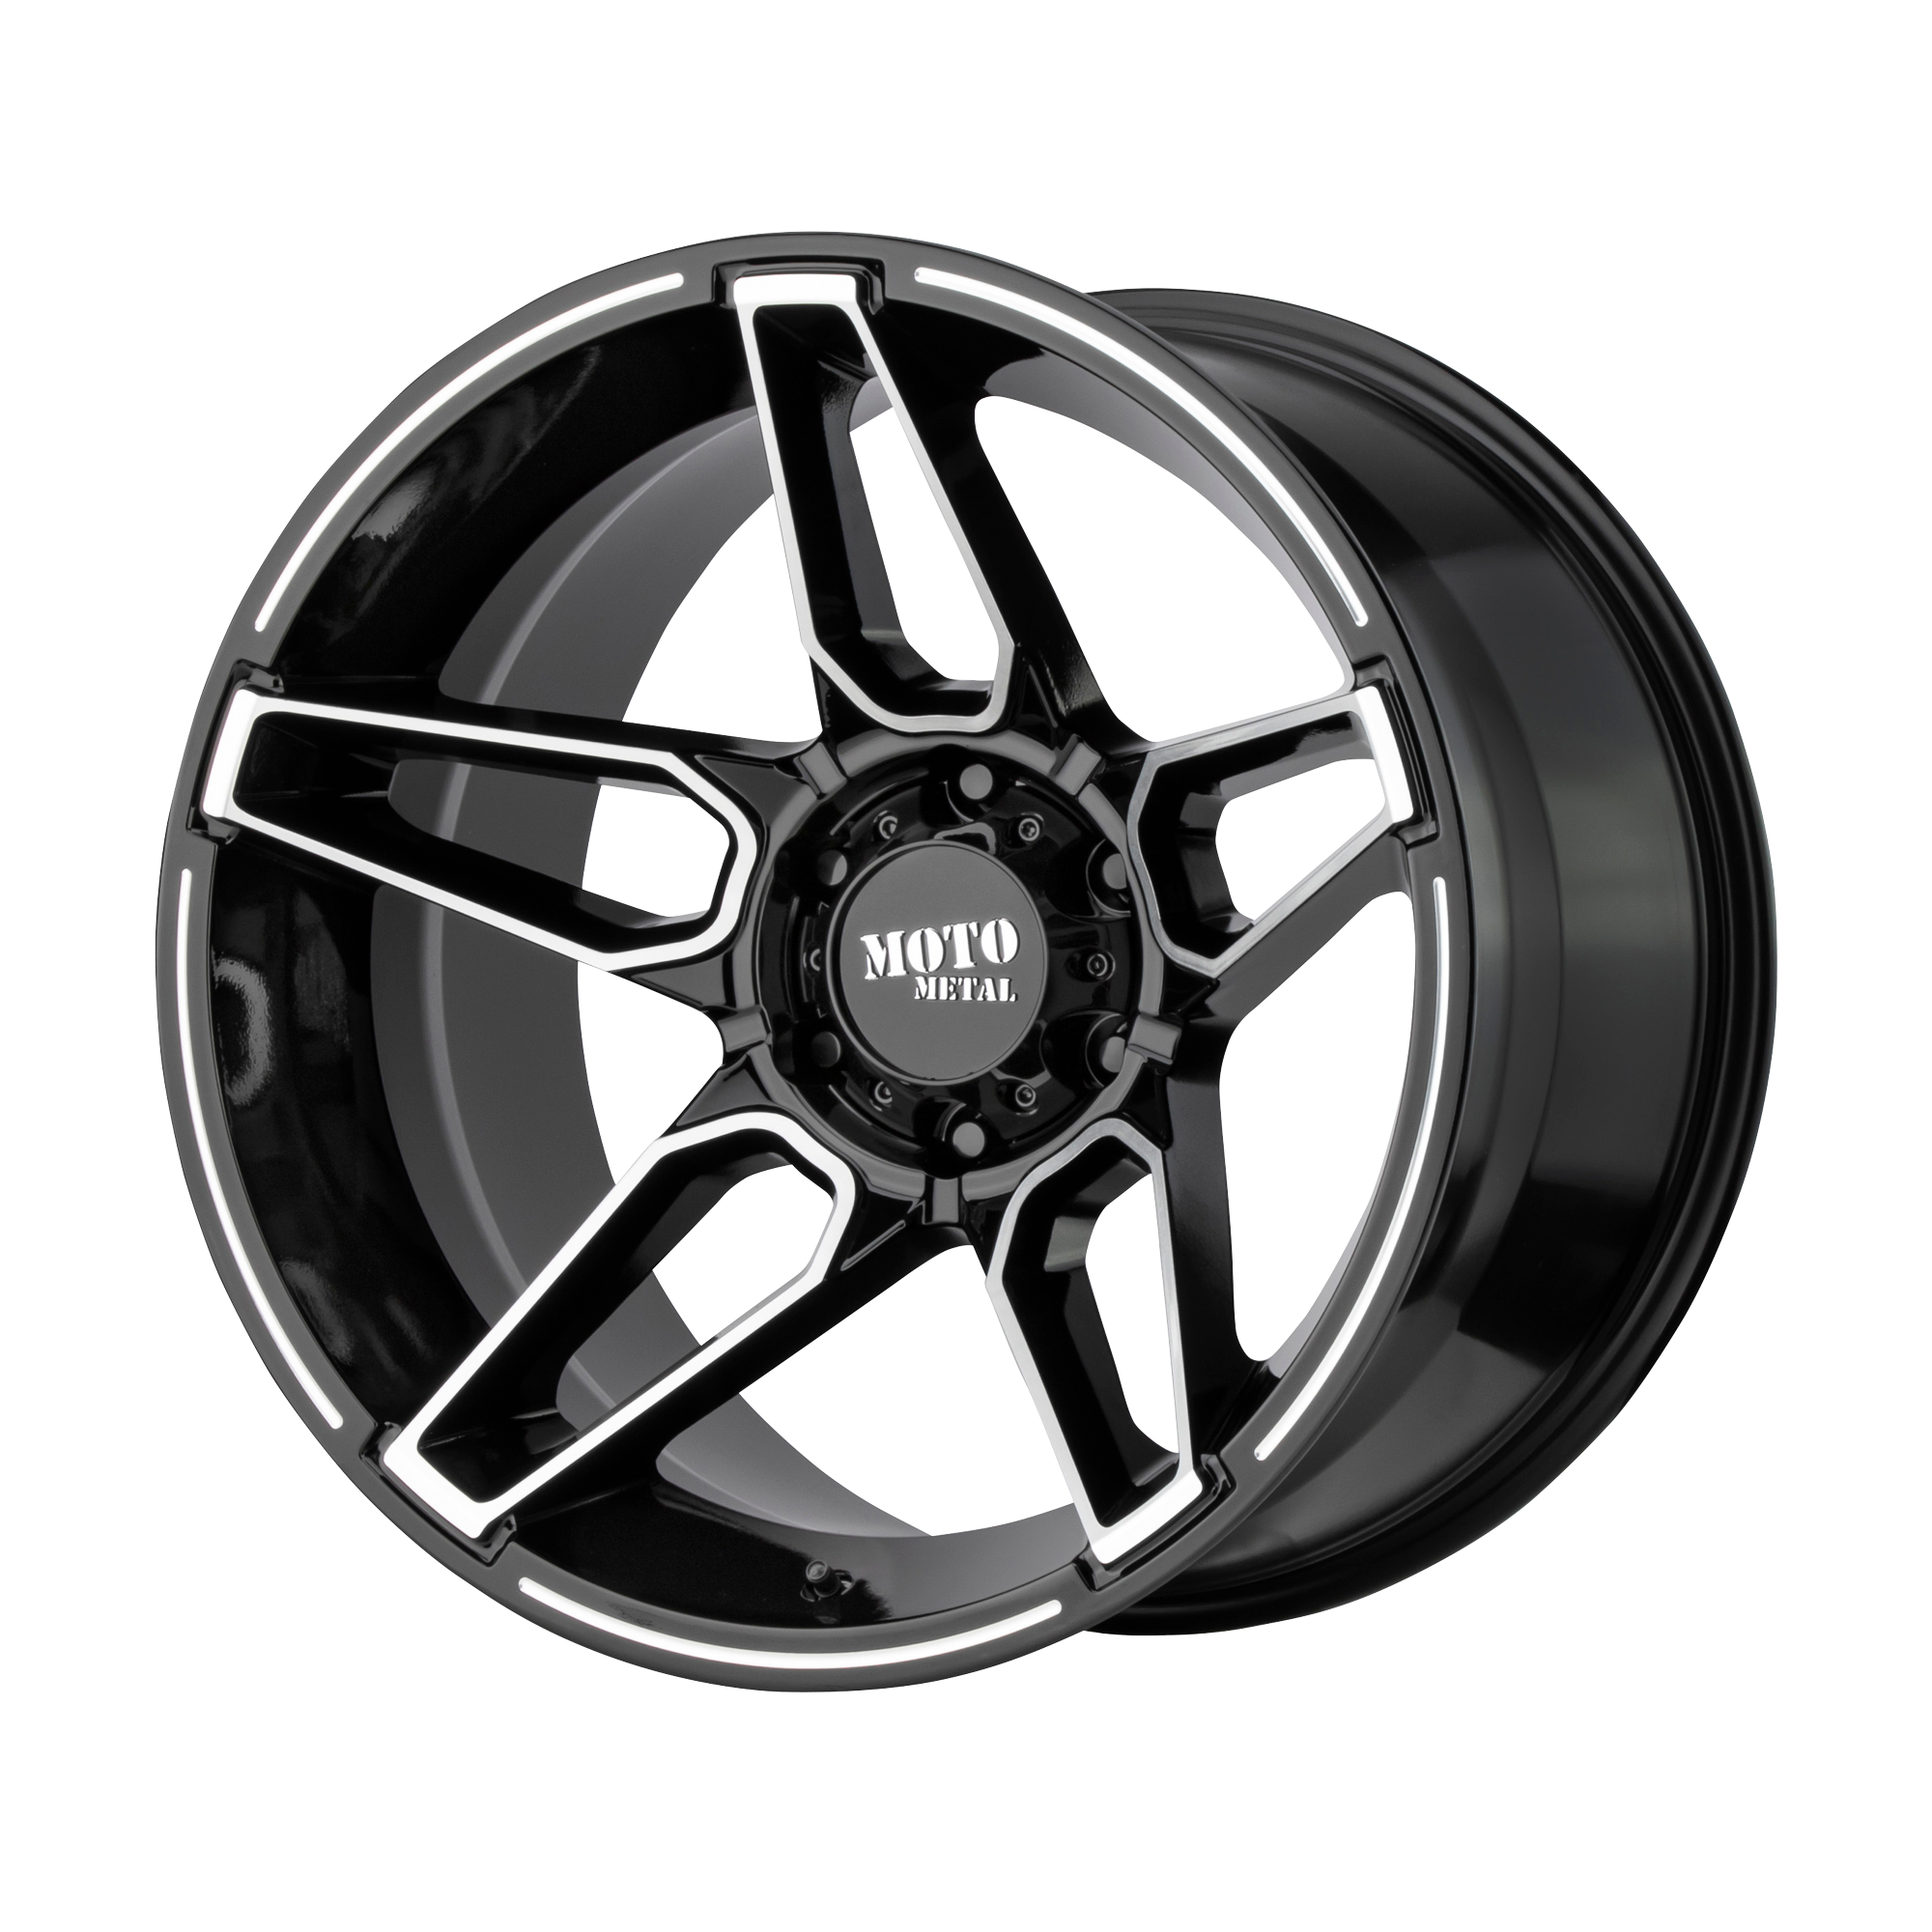 MOTO METAL MO994 FANG hliníkové disky 9x20 6x139,7 ET0 Gloss Black Machined